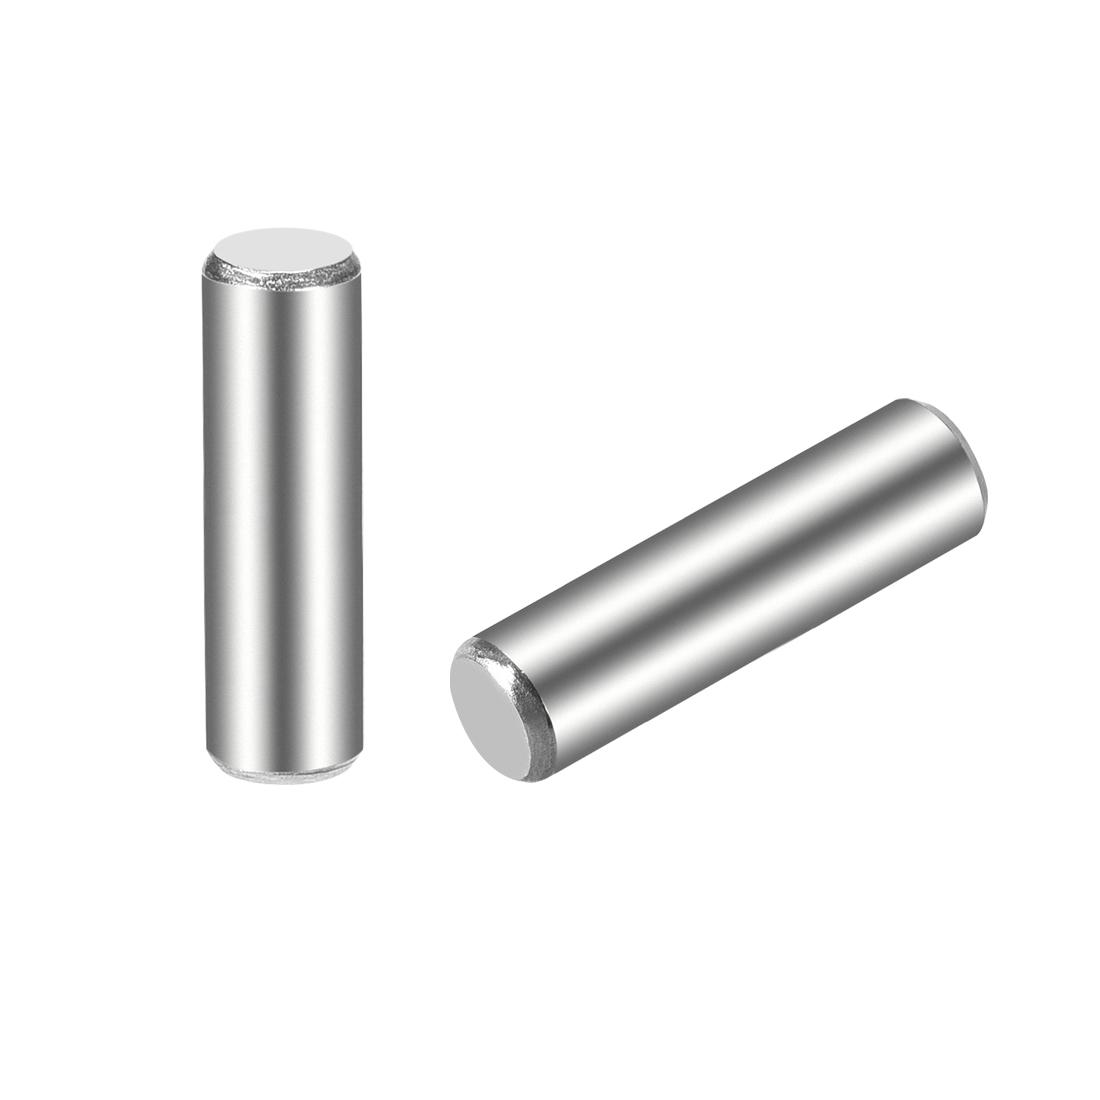 25Pcs 5mm x 18mm Dowel Pin 304 Stainless Steel Shelf Support Pin Fasten